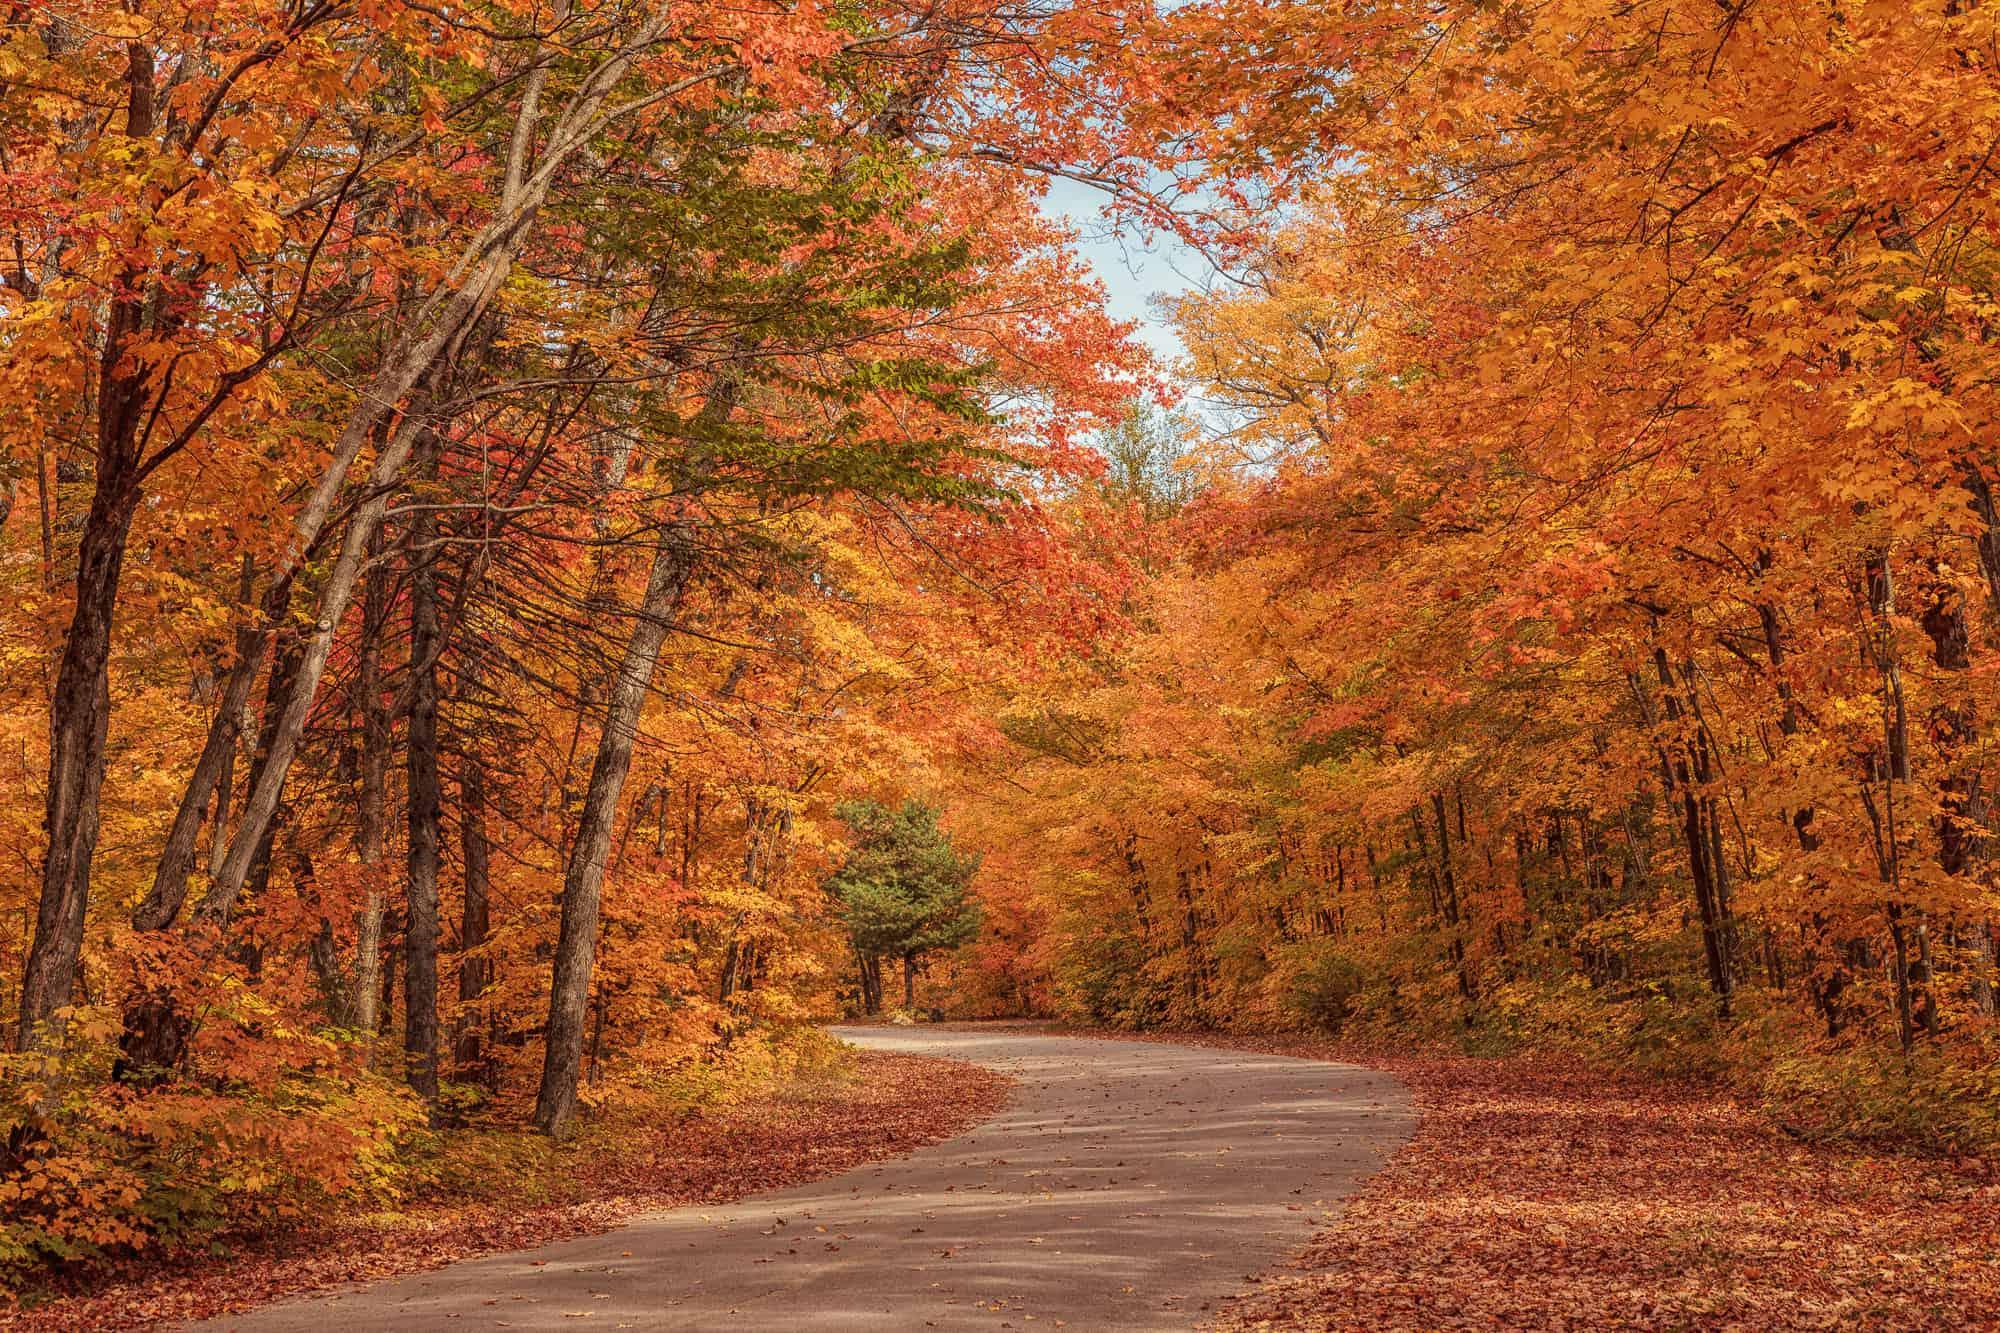 Central Park Fall Desktop Wallpaper Algonquin Provincial Park 3 Essential Hikes Explore